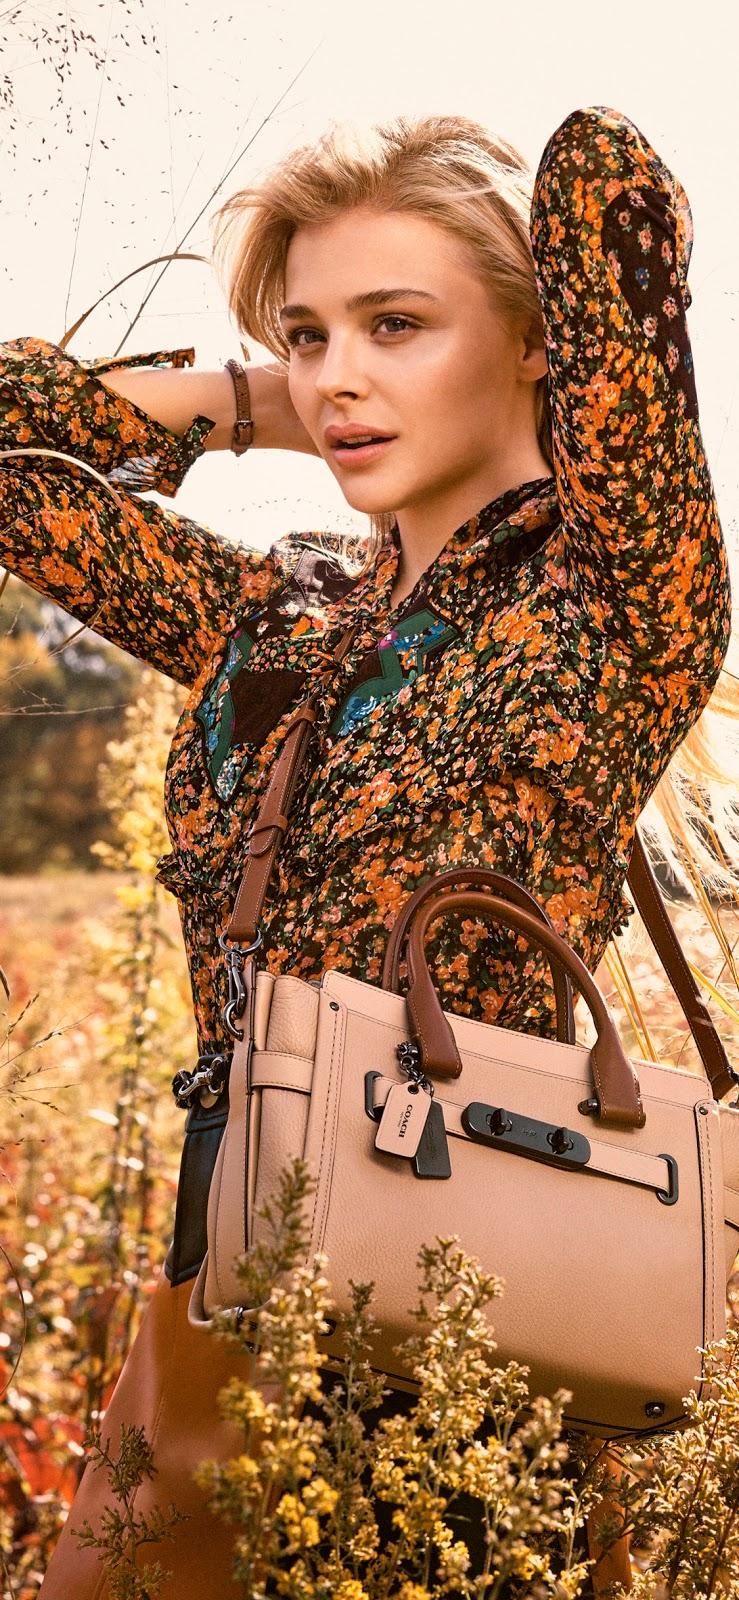 Chloë Grace Moretz outdoor photo shoot mobile wallpaper ...